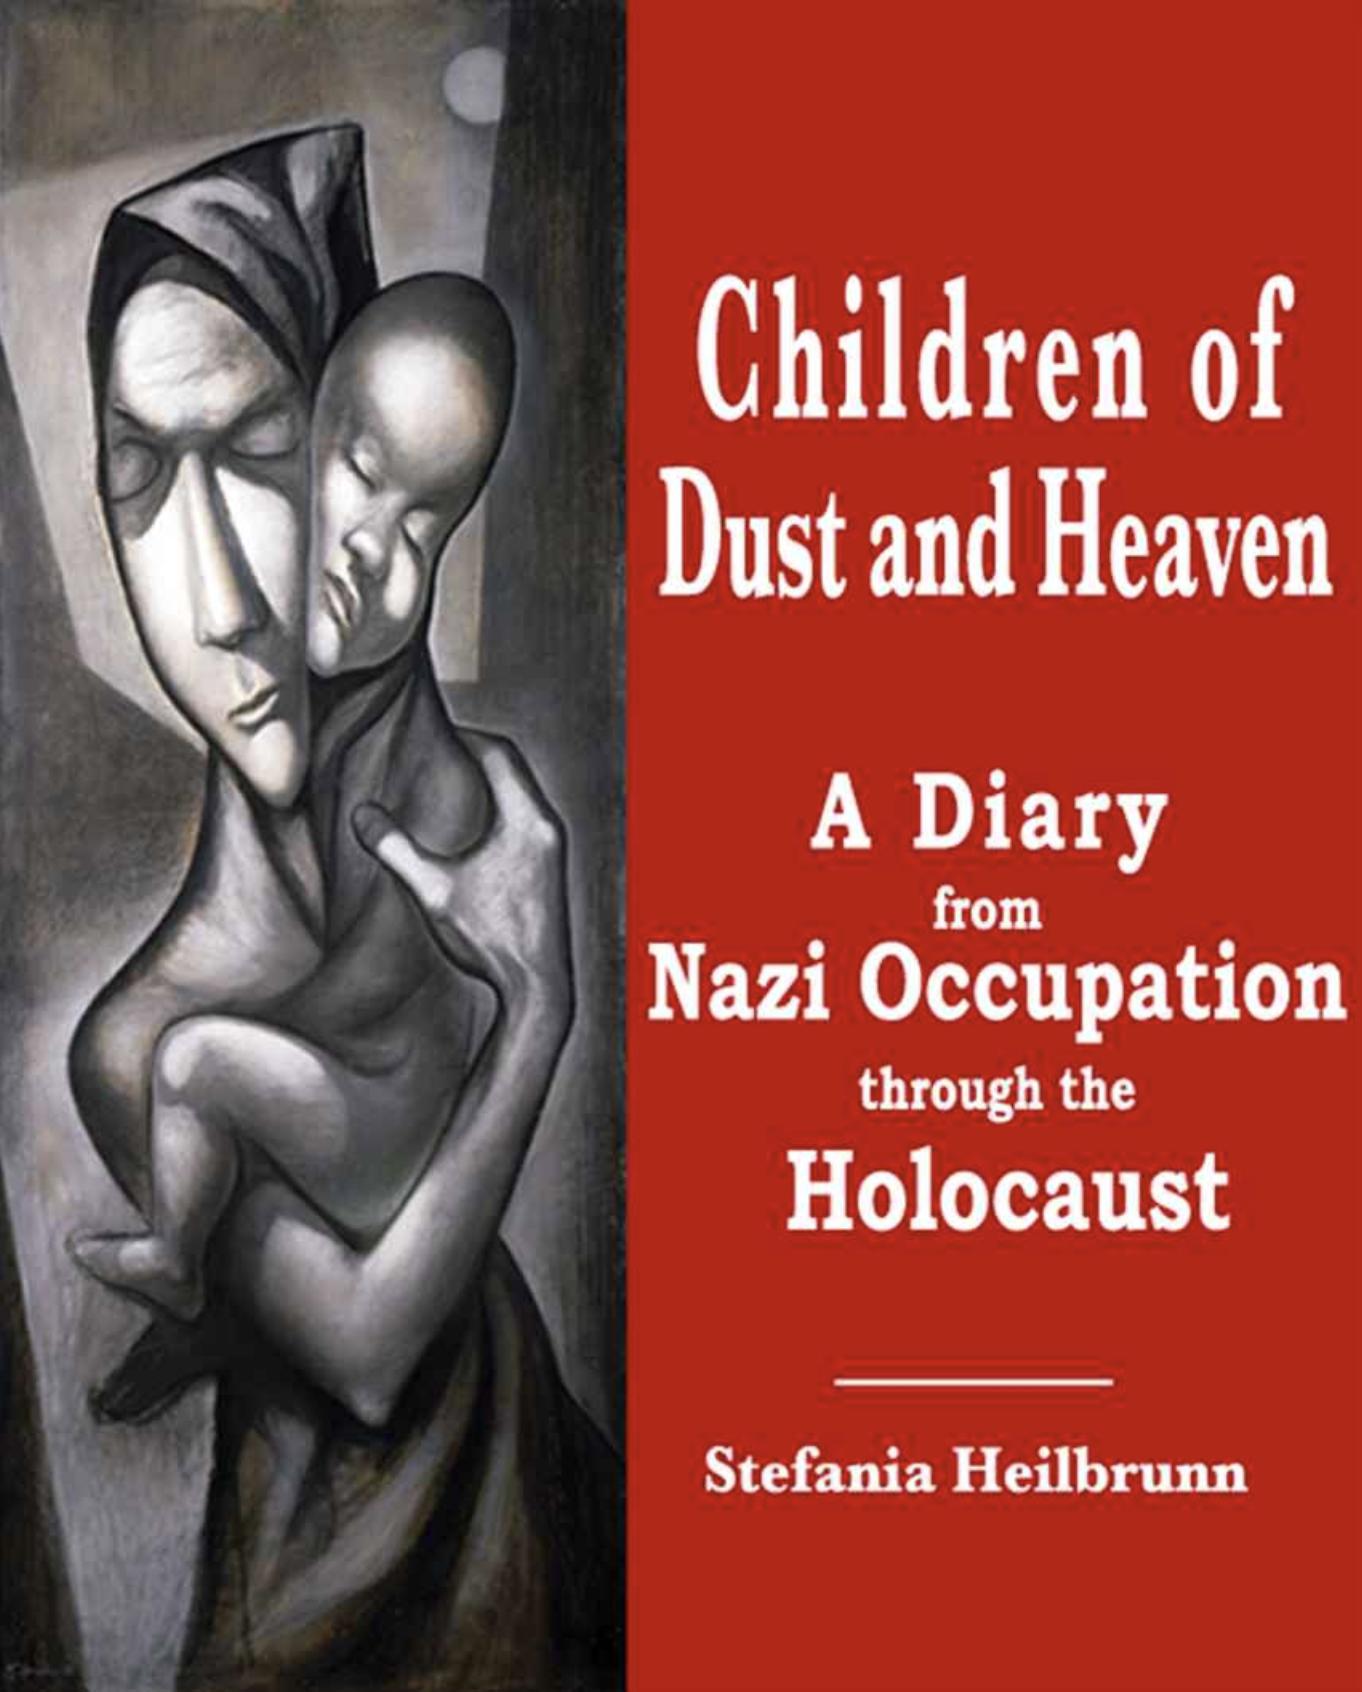 Children of Dust and Heaven